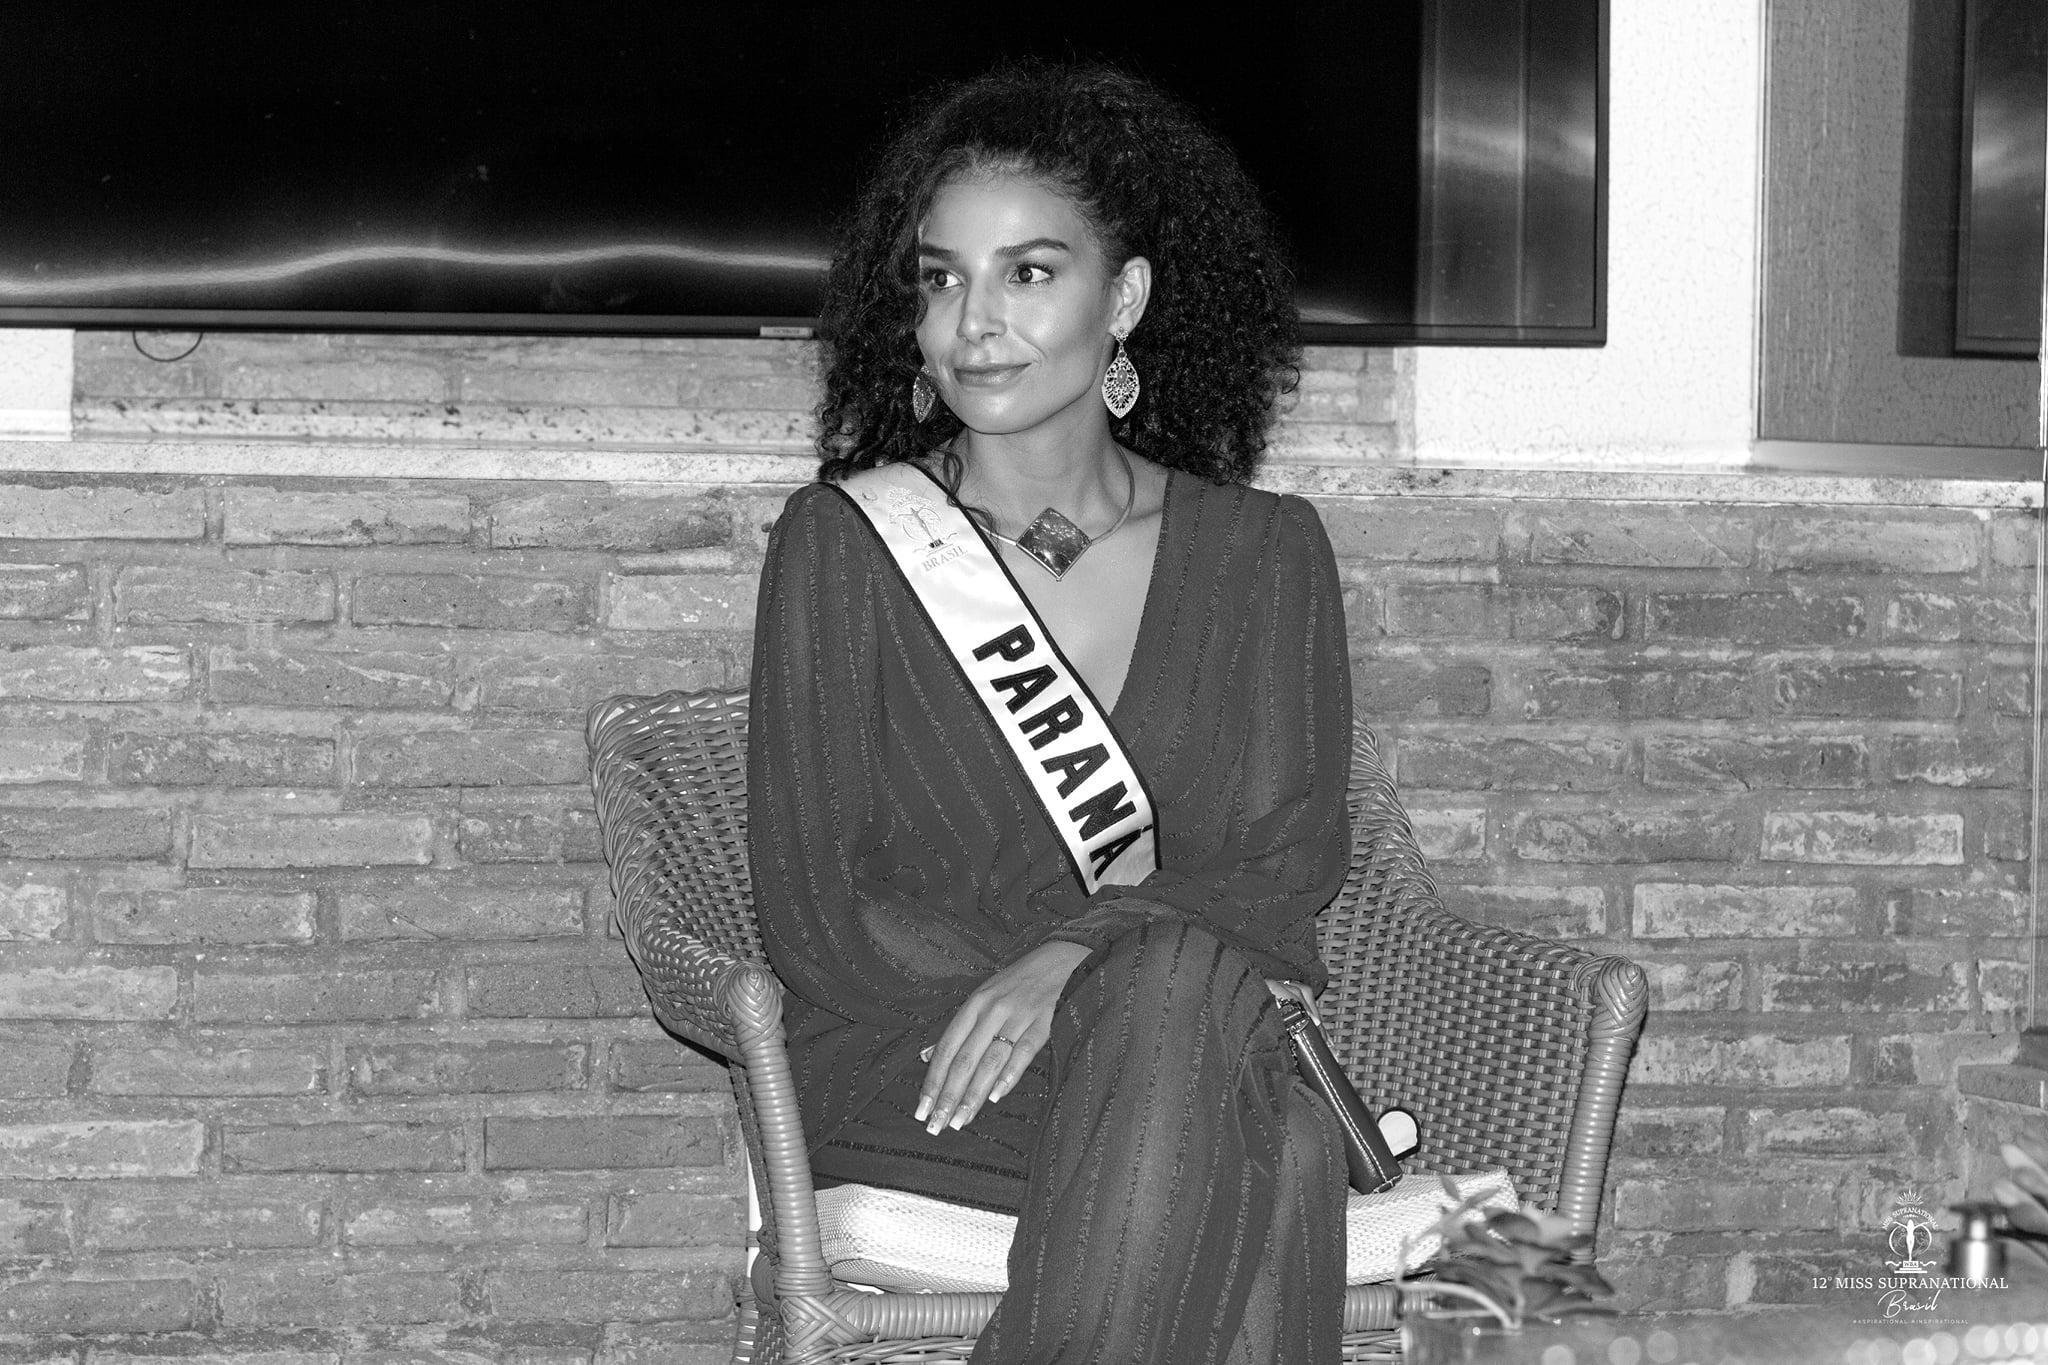 lua paschoalino, miss supranational parana 2020. - Página 4 12791111